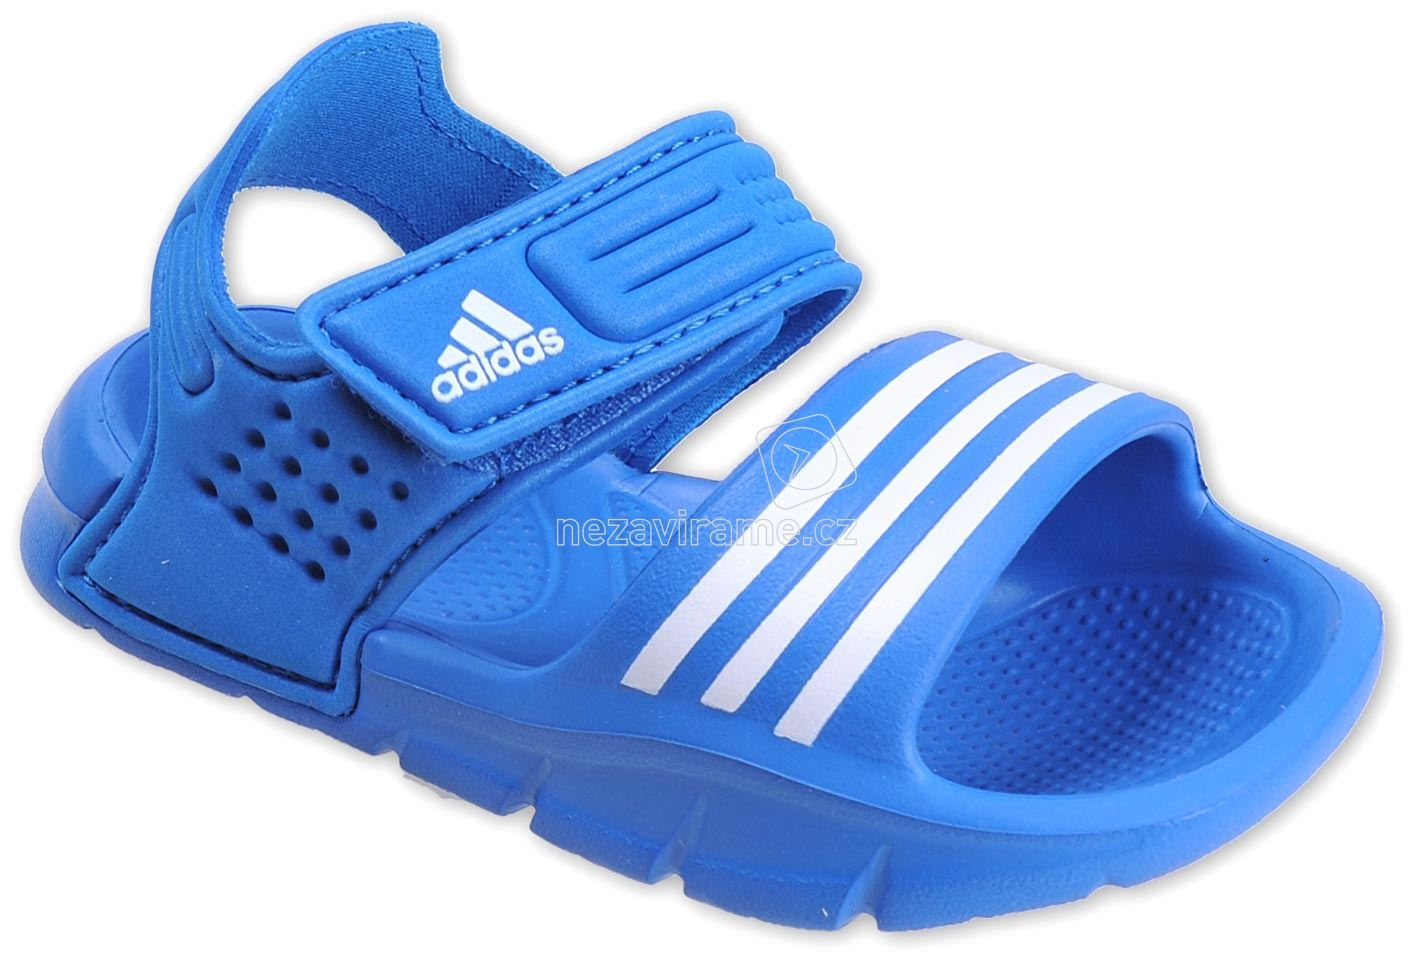 Detské plážovky adidas D65553